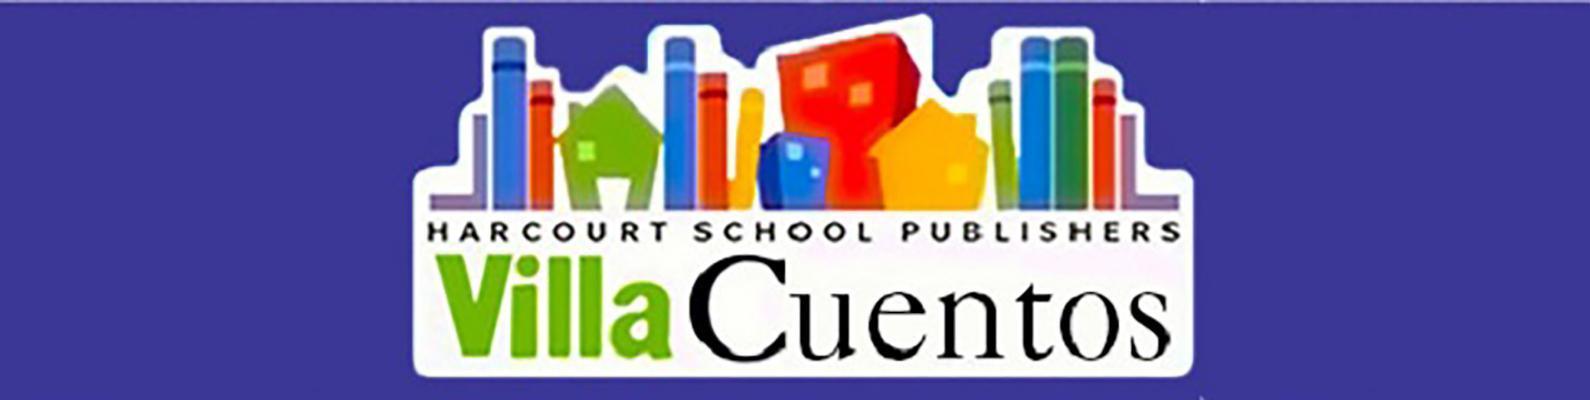 Harcourt School Publishers Villa Cuentos